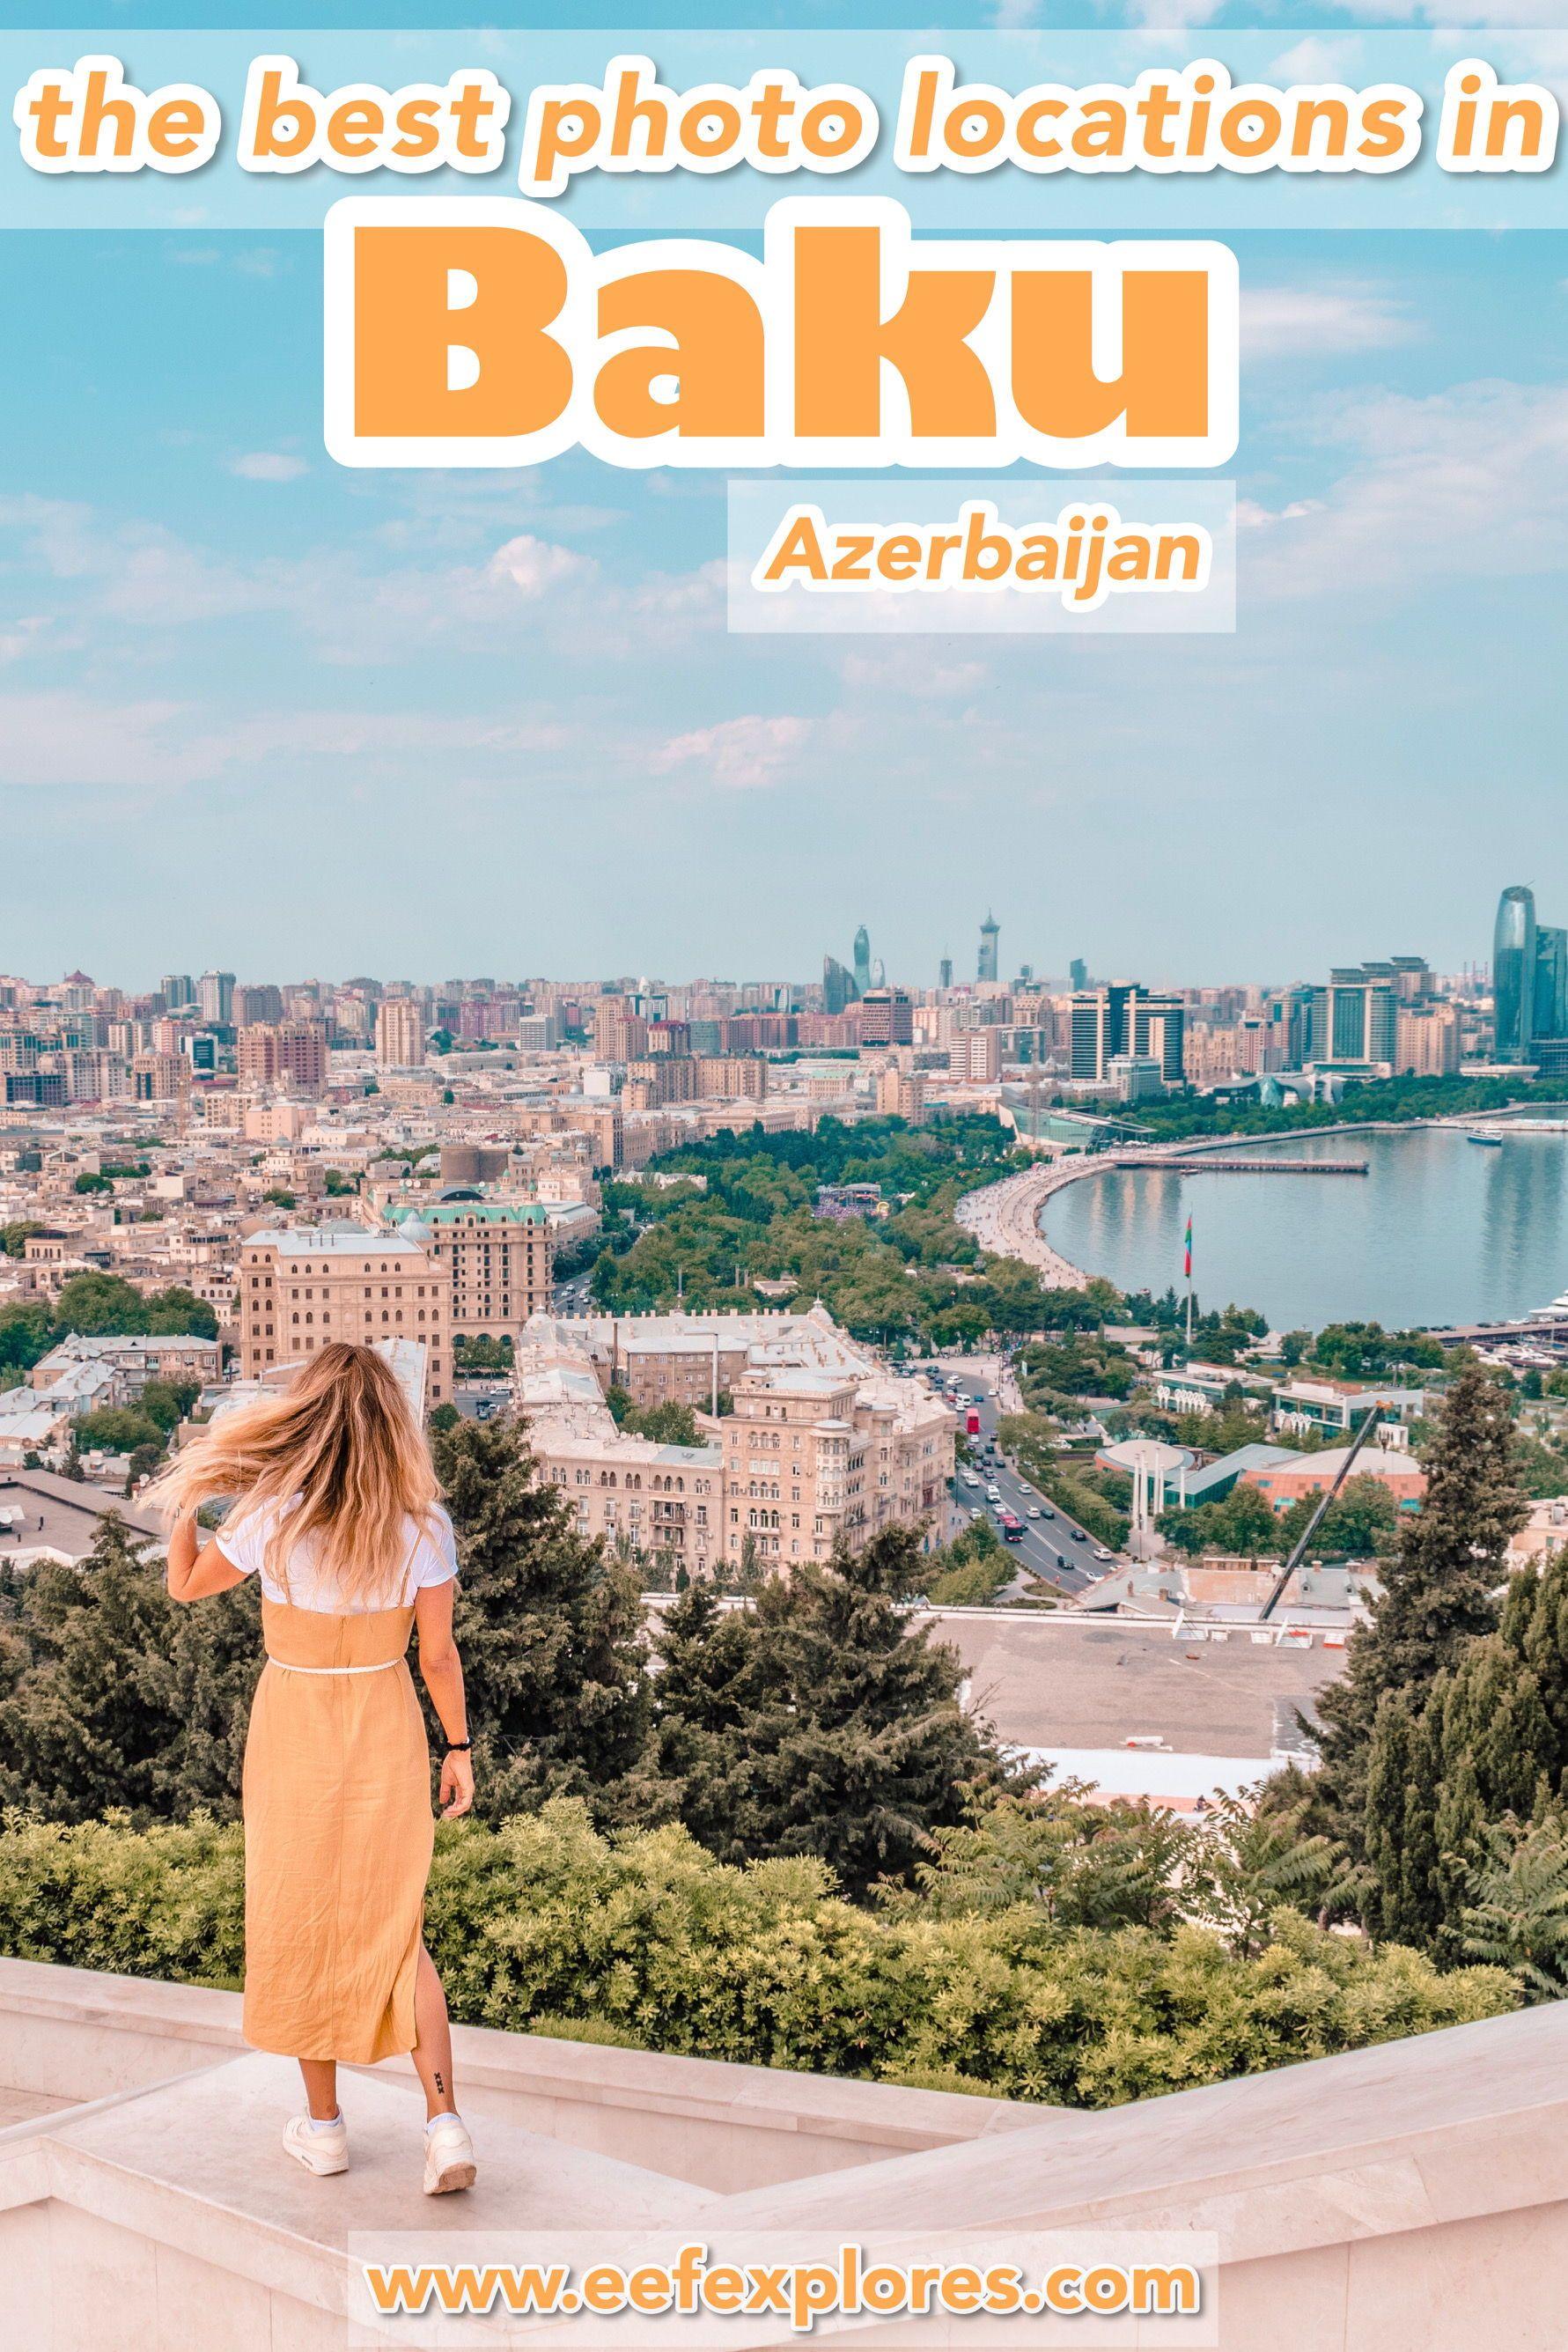 Planning A Trip To Baku The Capital Of Azerbaijan There Are Many Great Spots Azerbaijan Travel Travel Inspiration Destinations Travel Inspiration Wanderlust